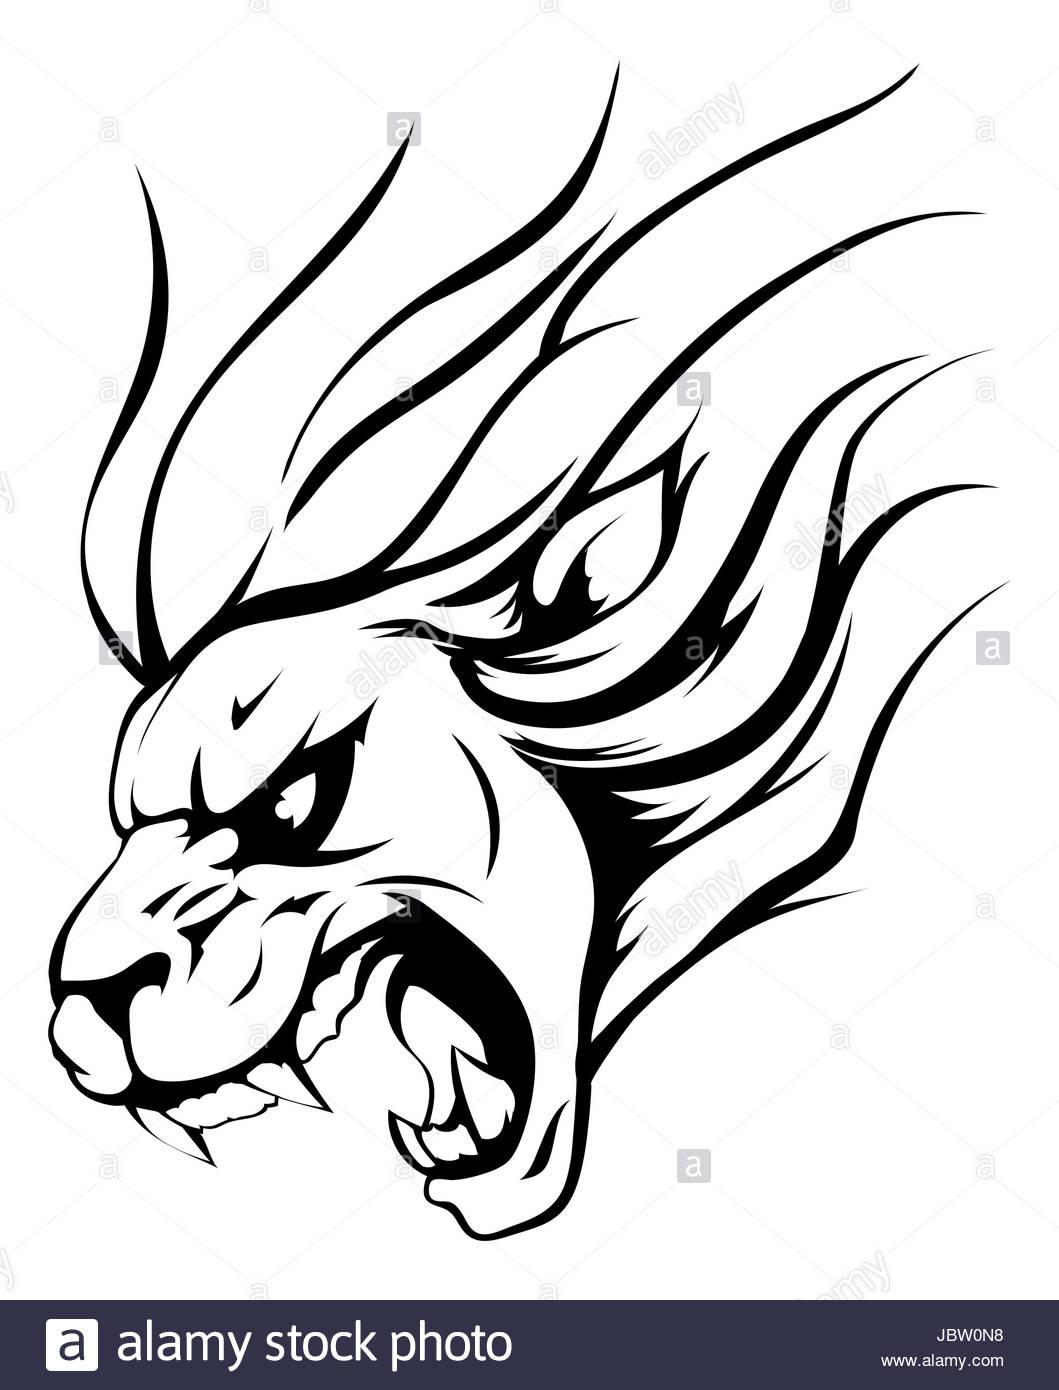 1059x1390 Lion Roar Cut Out Stock Images Amp Pictures